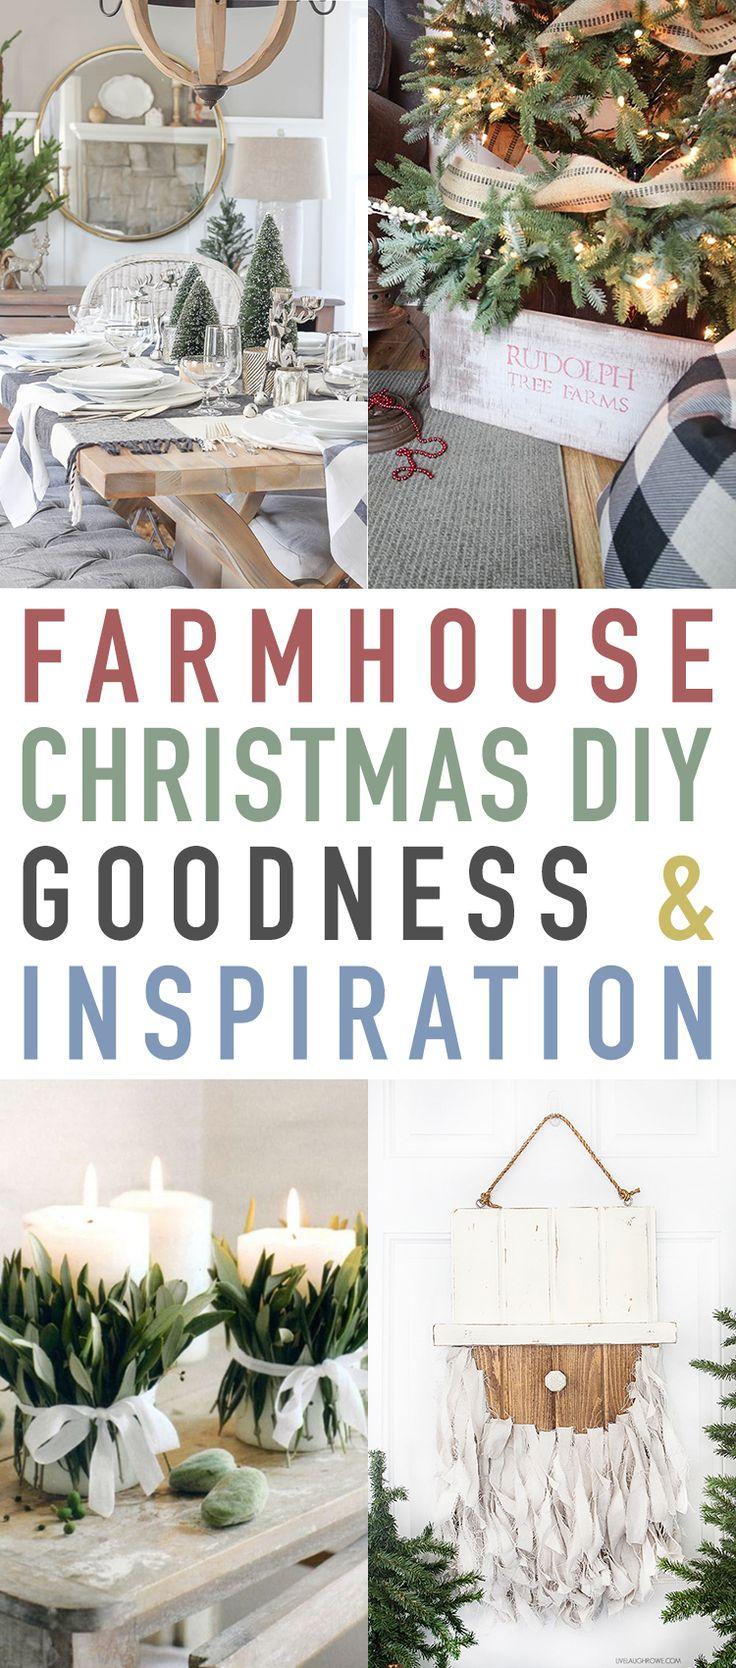 Farmhouse Christmas DIY Goodness and Inspiration